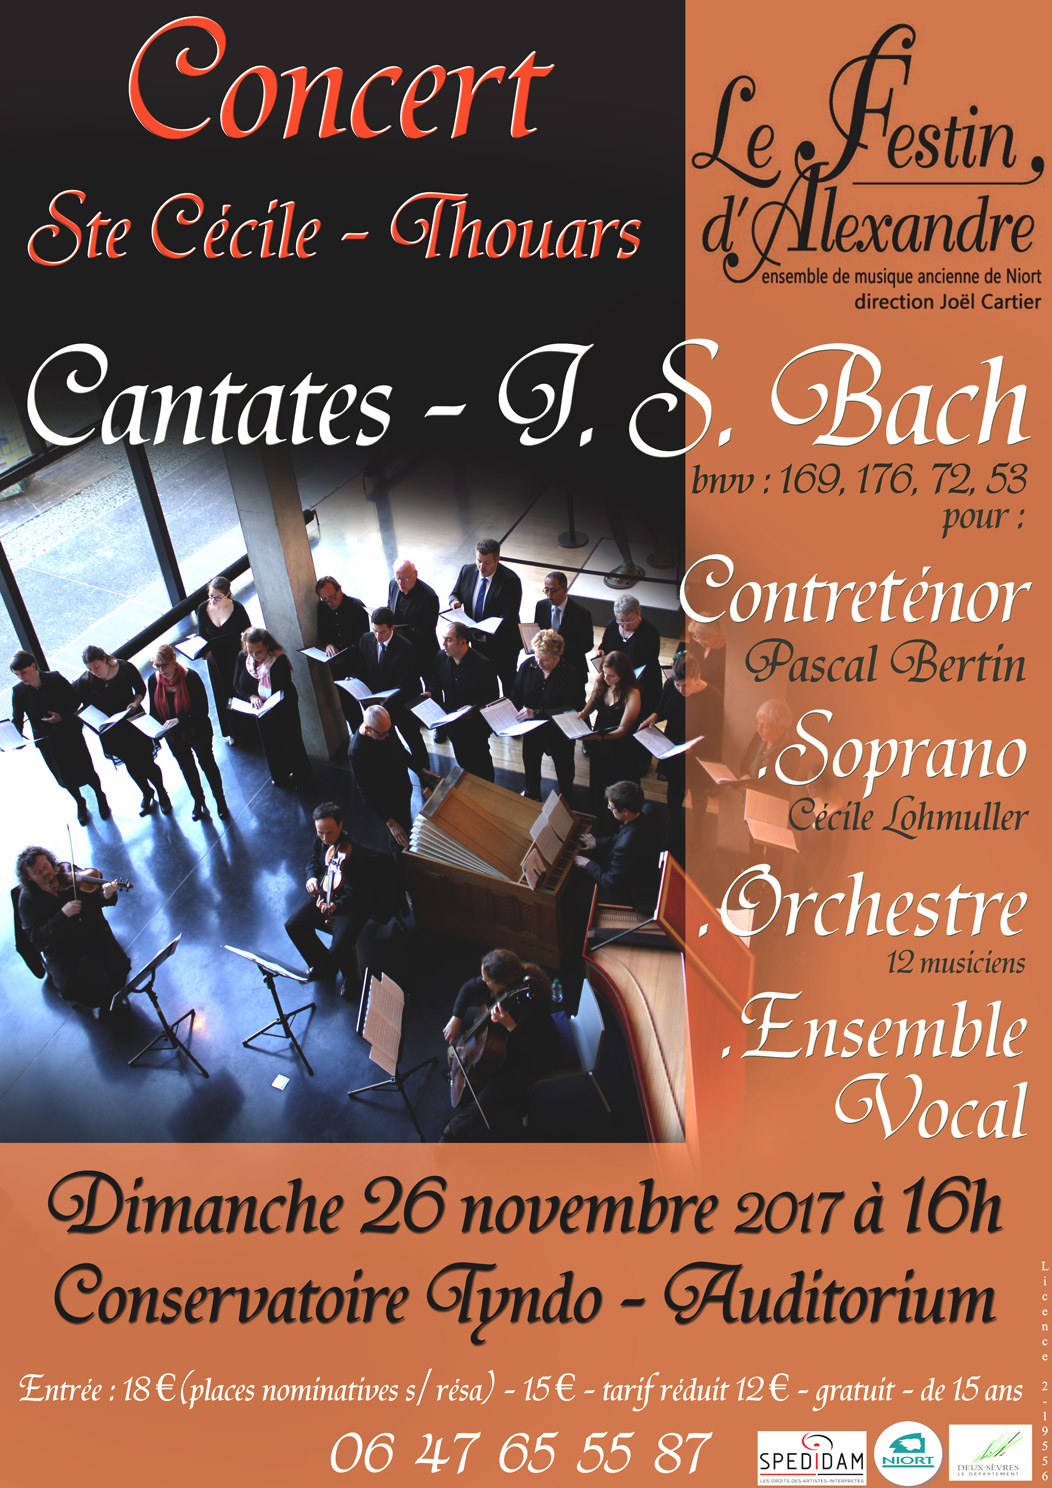 Cantates Bach - Contreténor